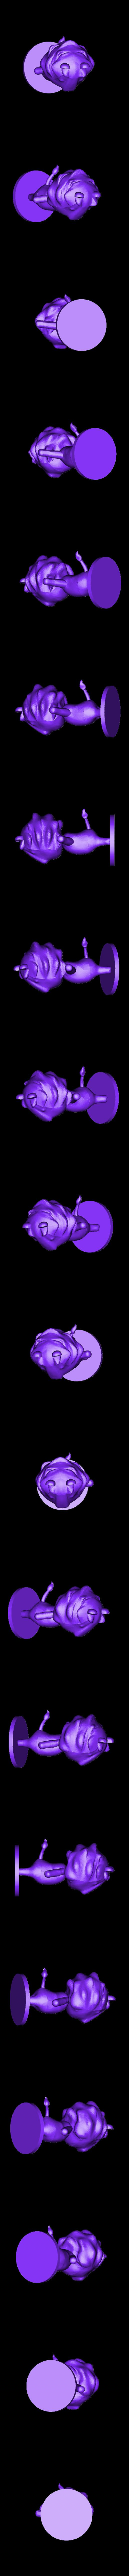 lion_full.stl Download free STL file Rex - Animal Crossing • 3D printable object, skelei